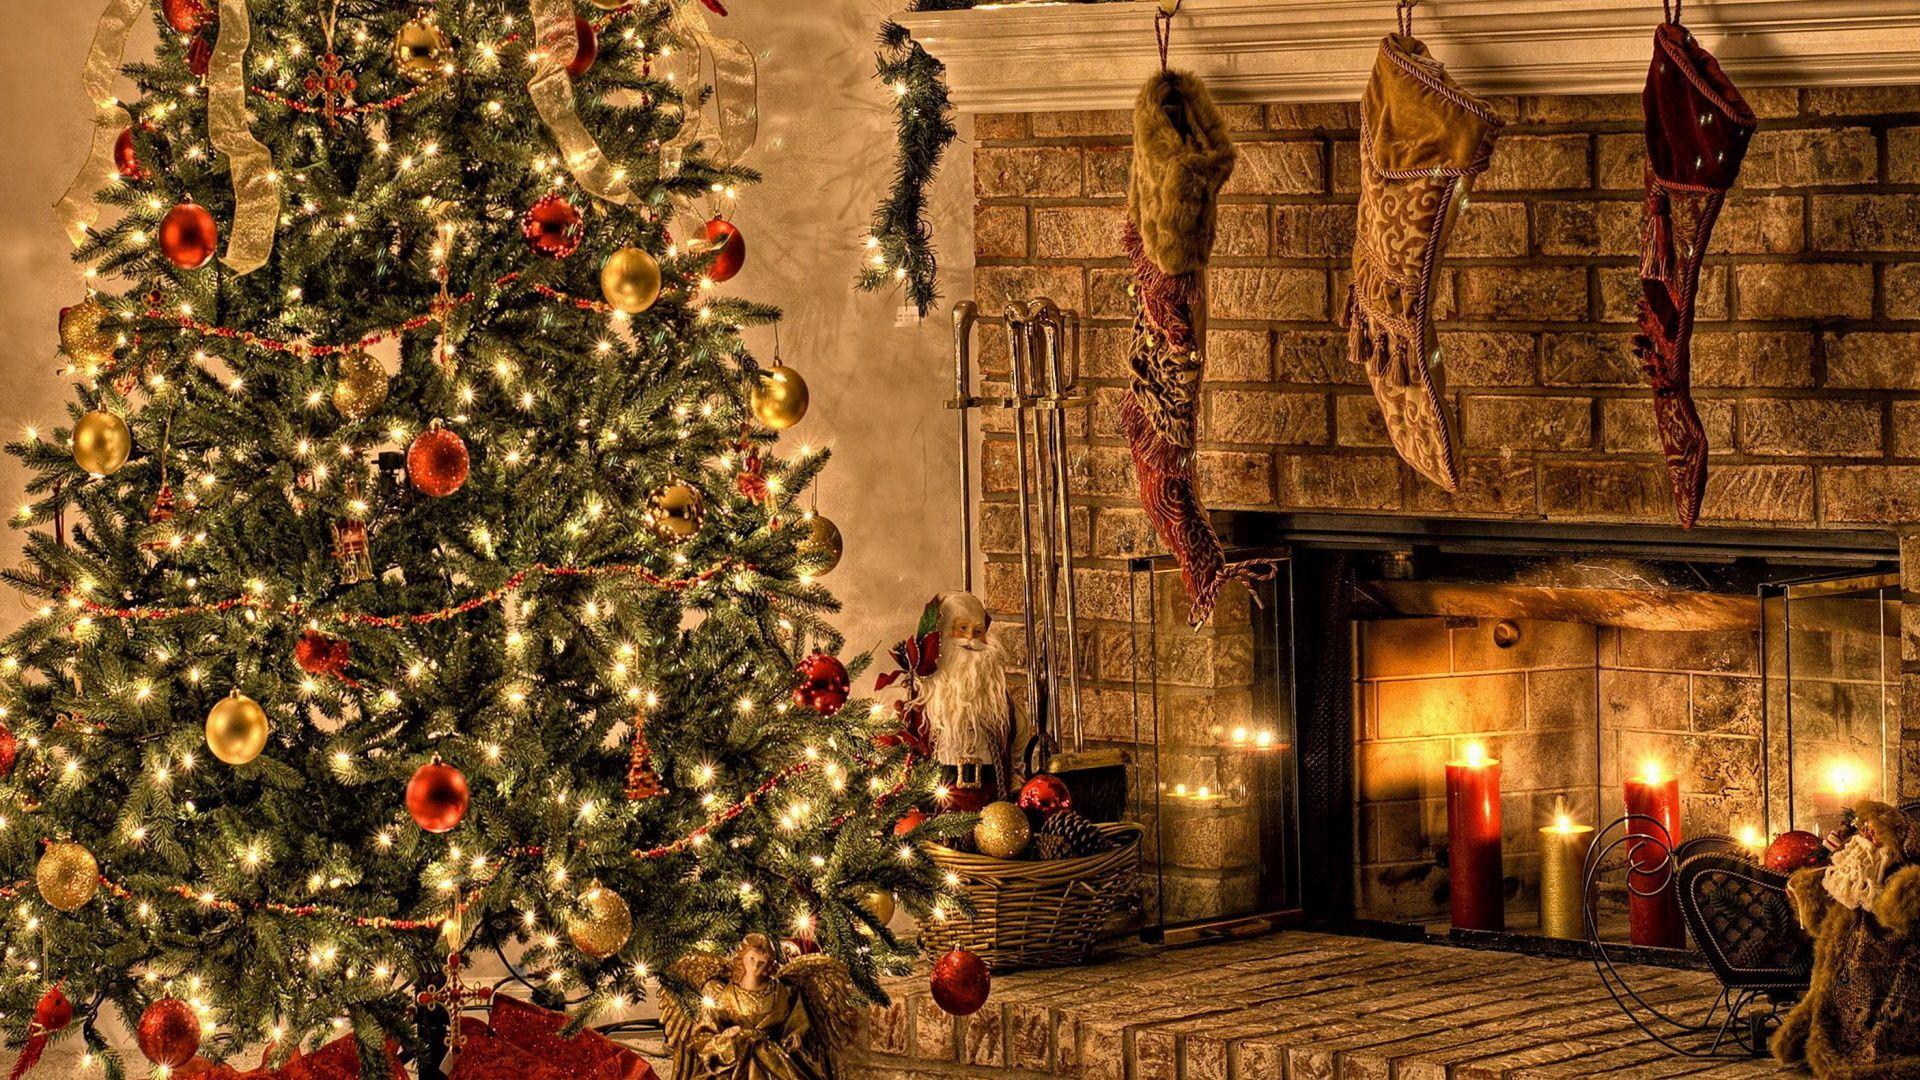 Christmas Fireplace Comfort Cool HD Wallpaper